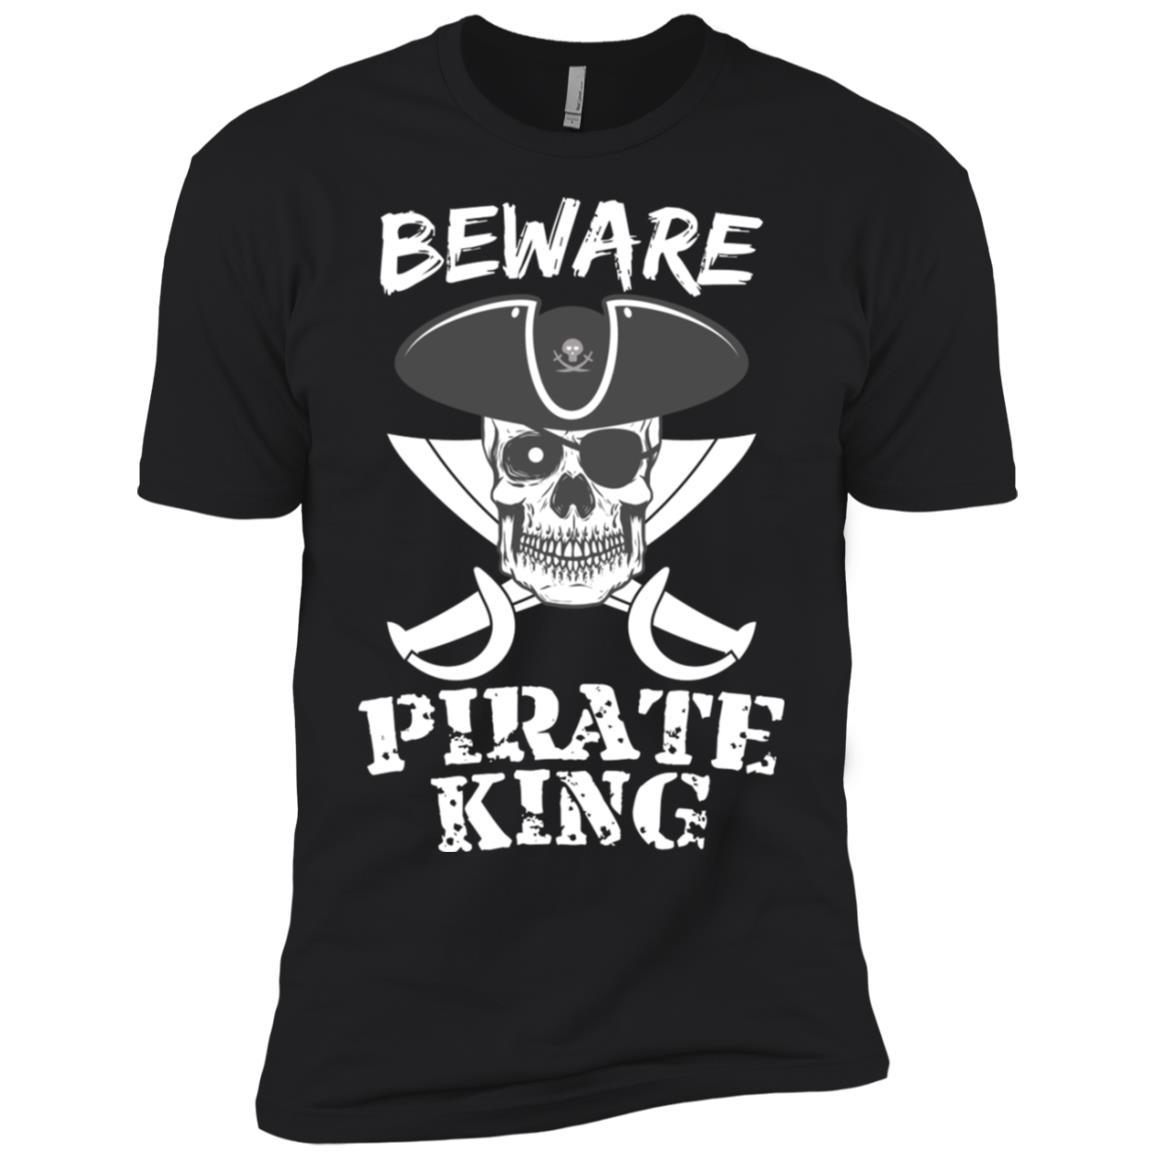 Beware Pirate King Skull Pirate Motorcyclists Men Short Sleeve T-Shirt